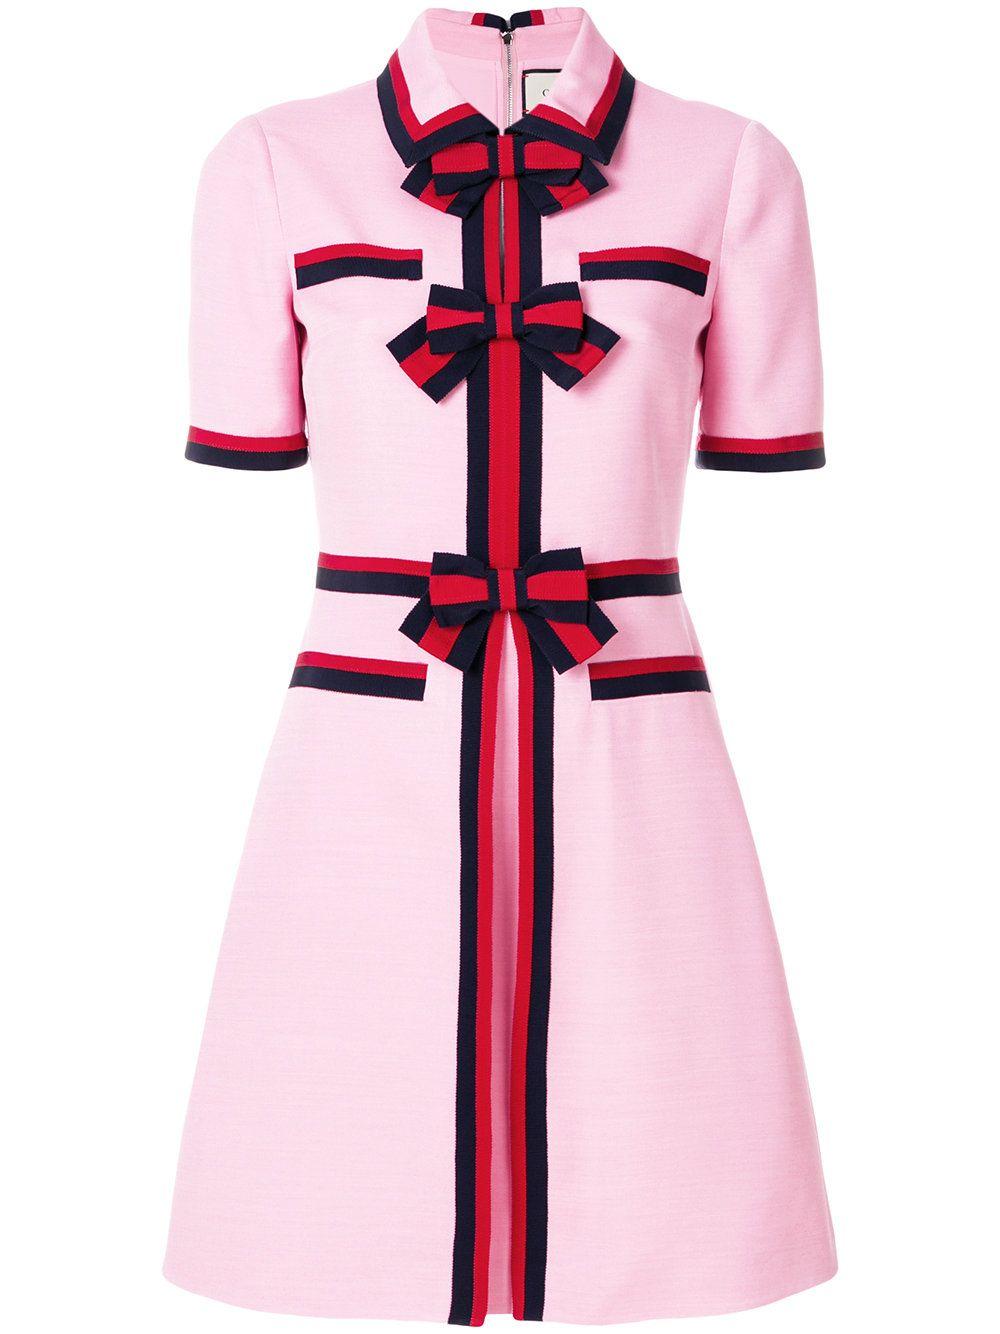 46728ec653 Gucci Bow detailed dress Γυναικεία Μόδα